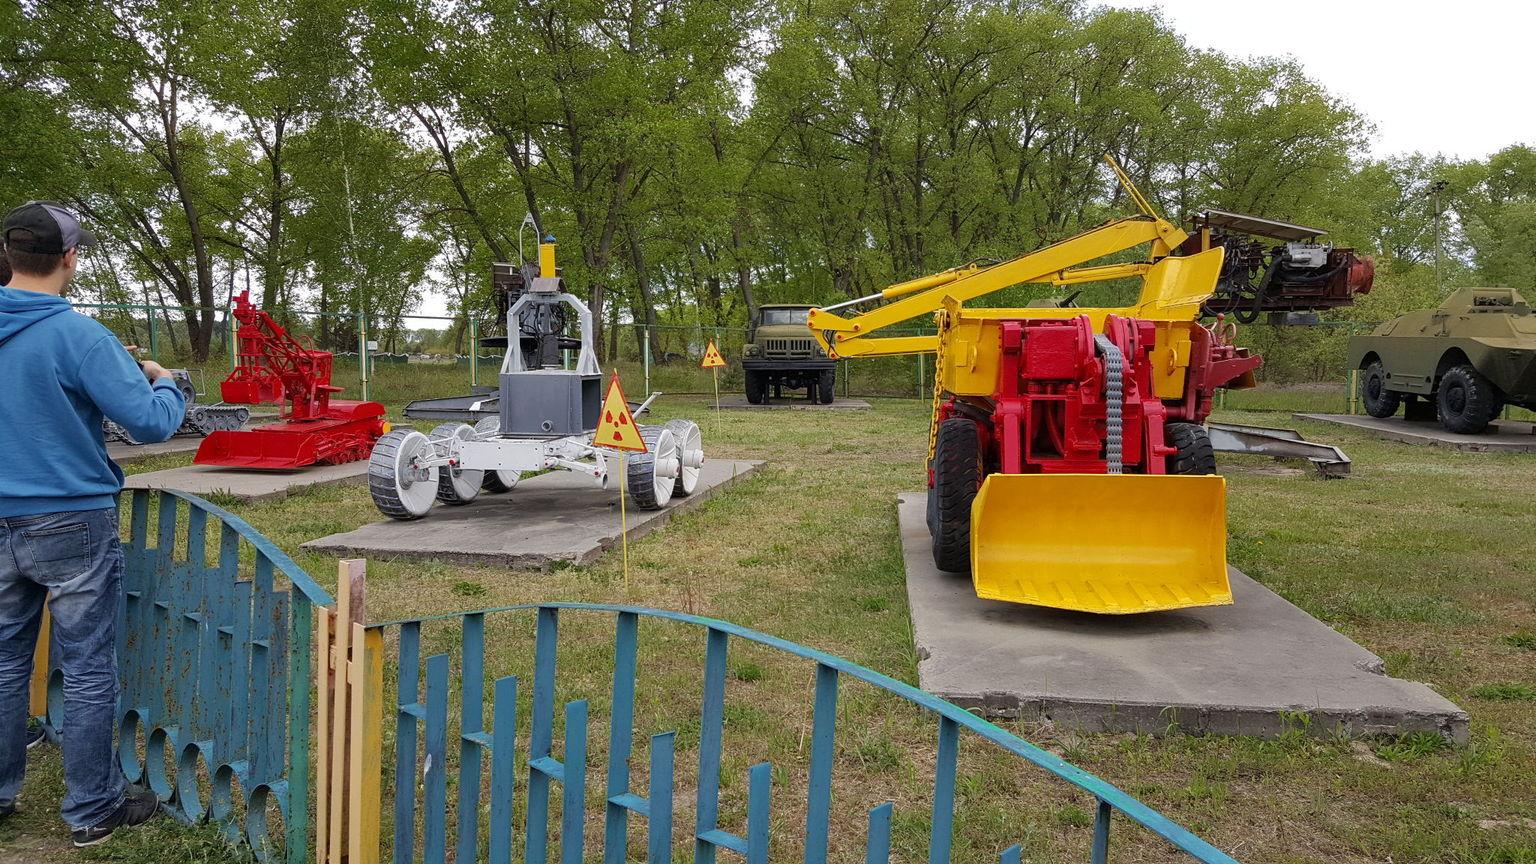 MÁS FOTOS, Excursión definitiva de 2 días a Chernóbil con salida desde Kiev